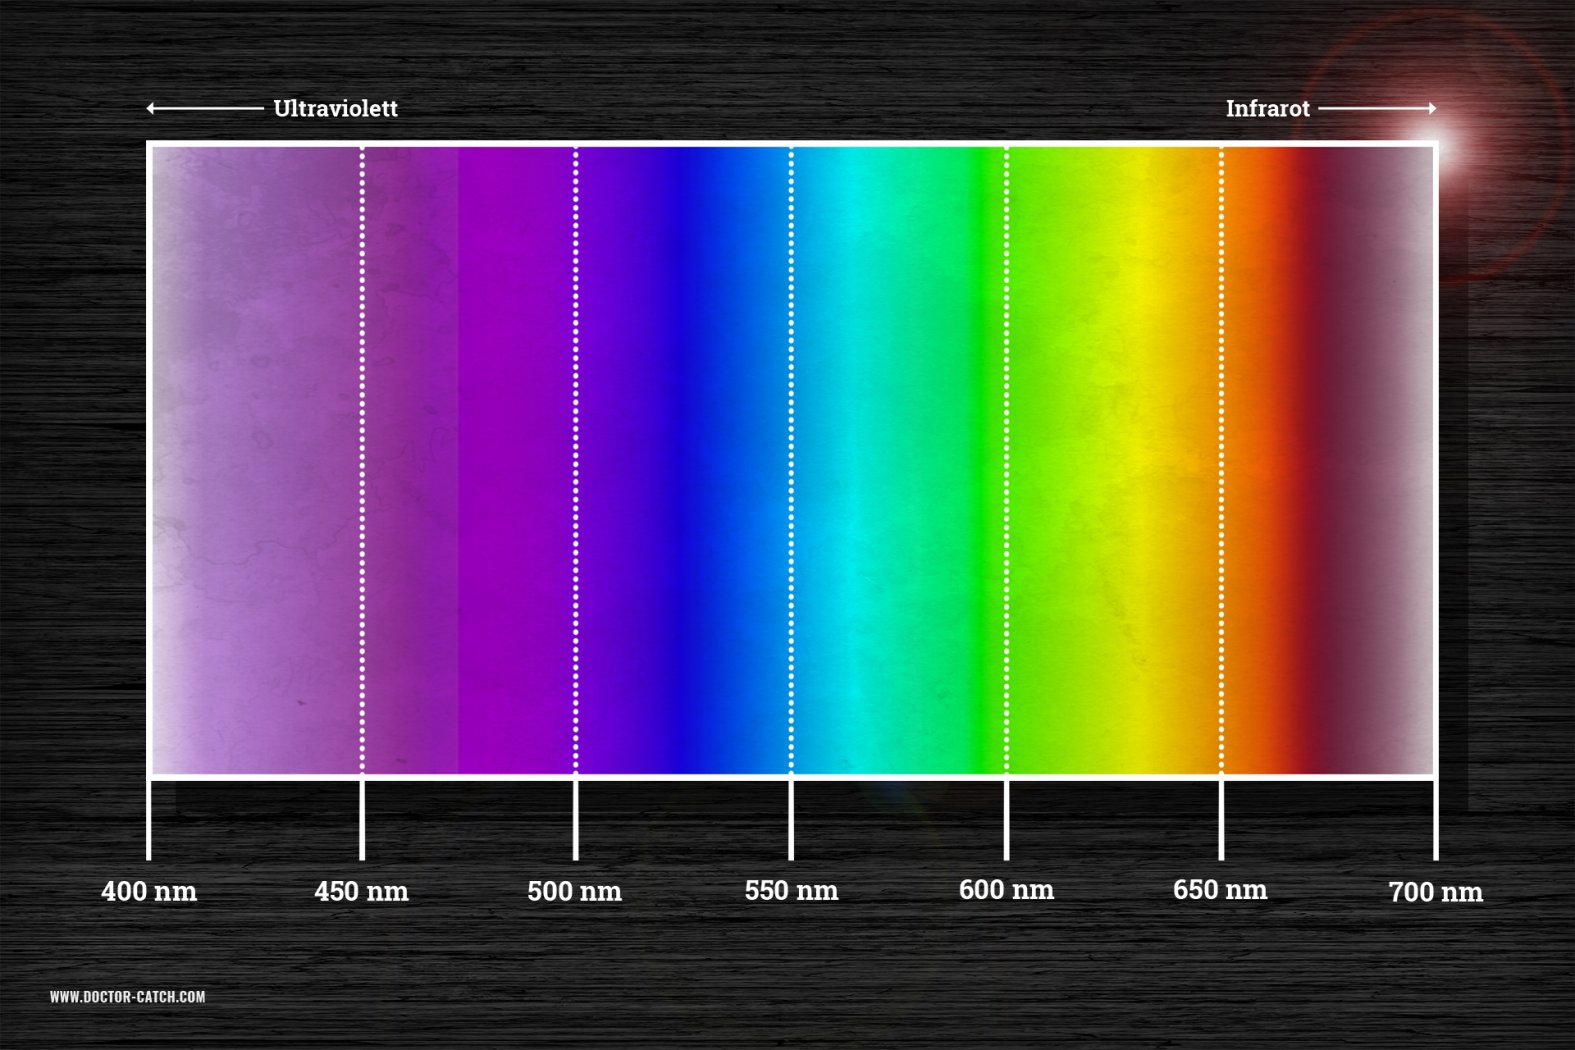 Wellenlänge UV-Farben